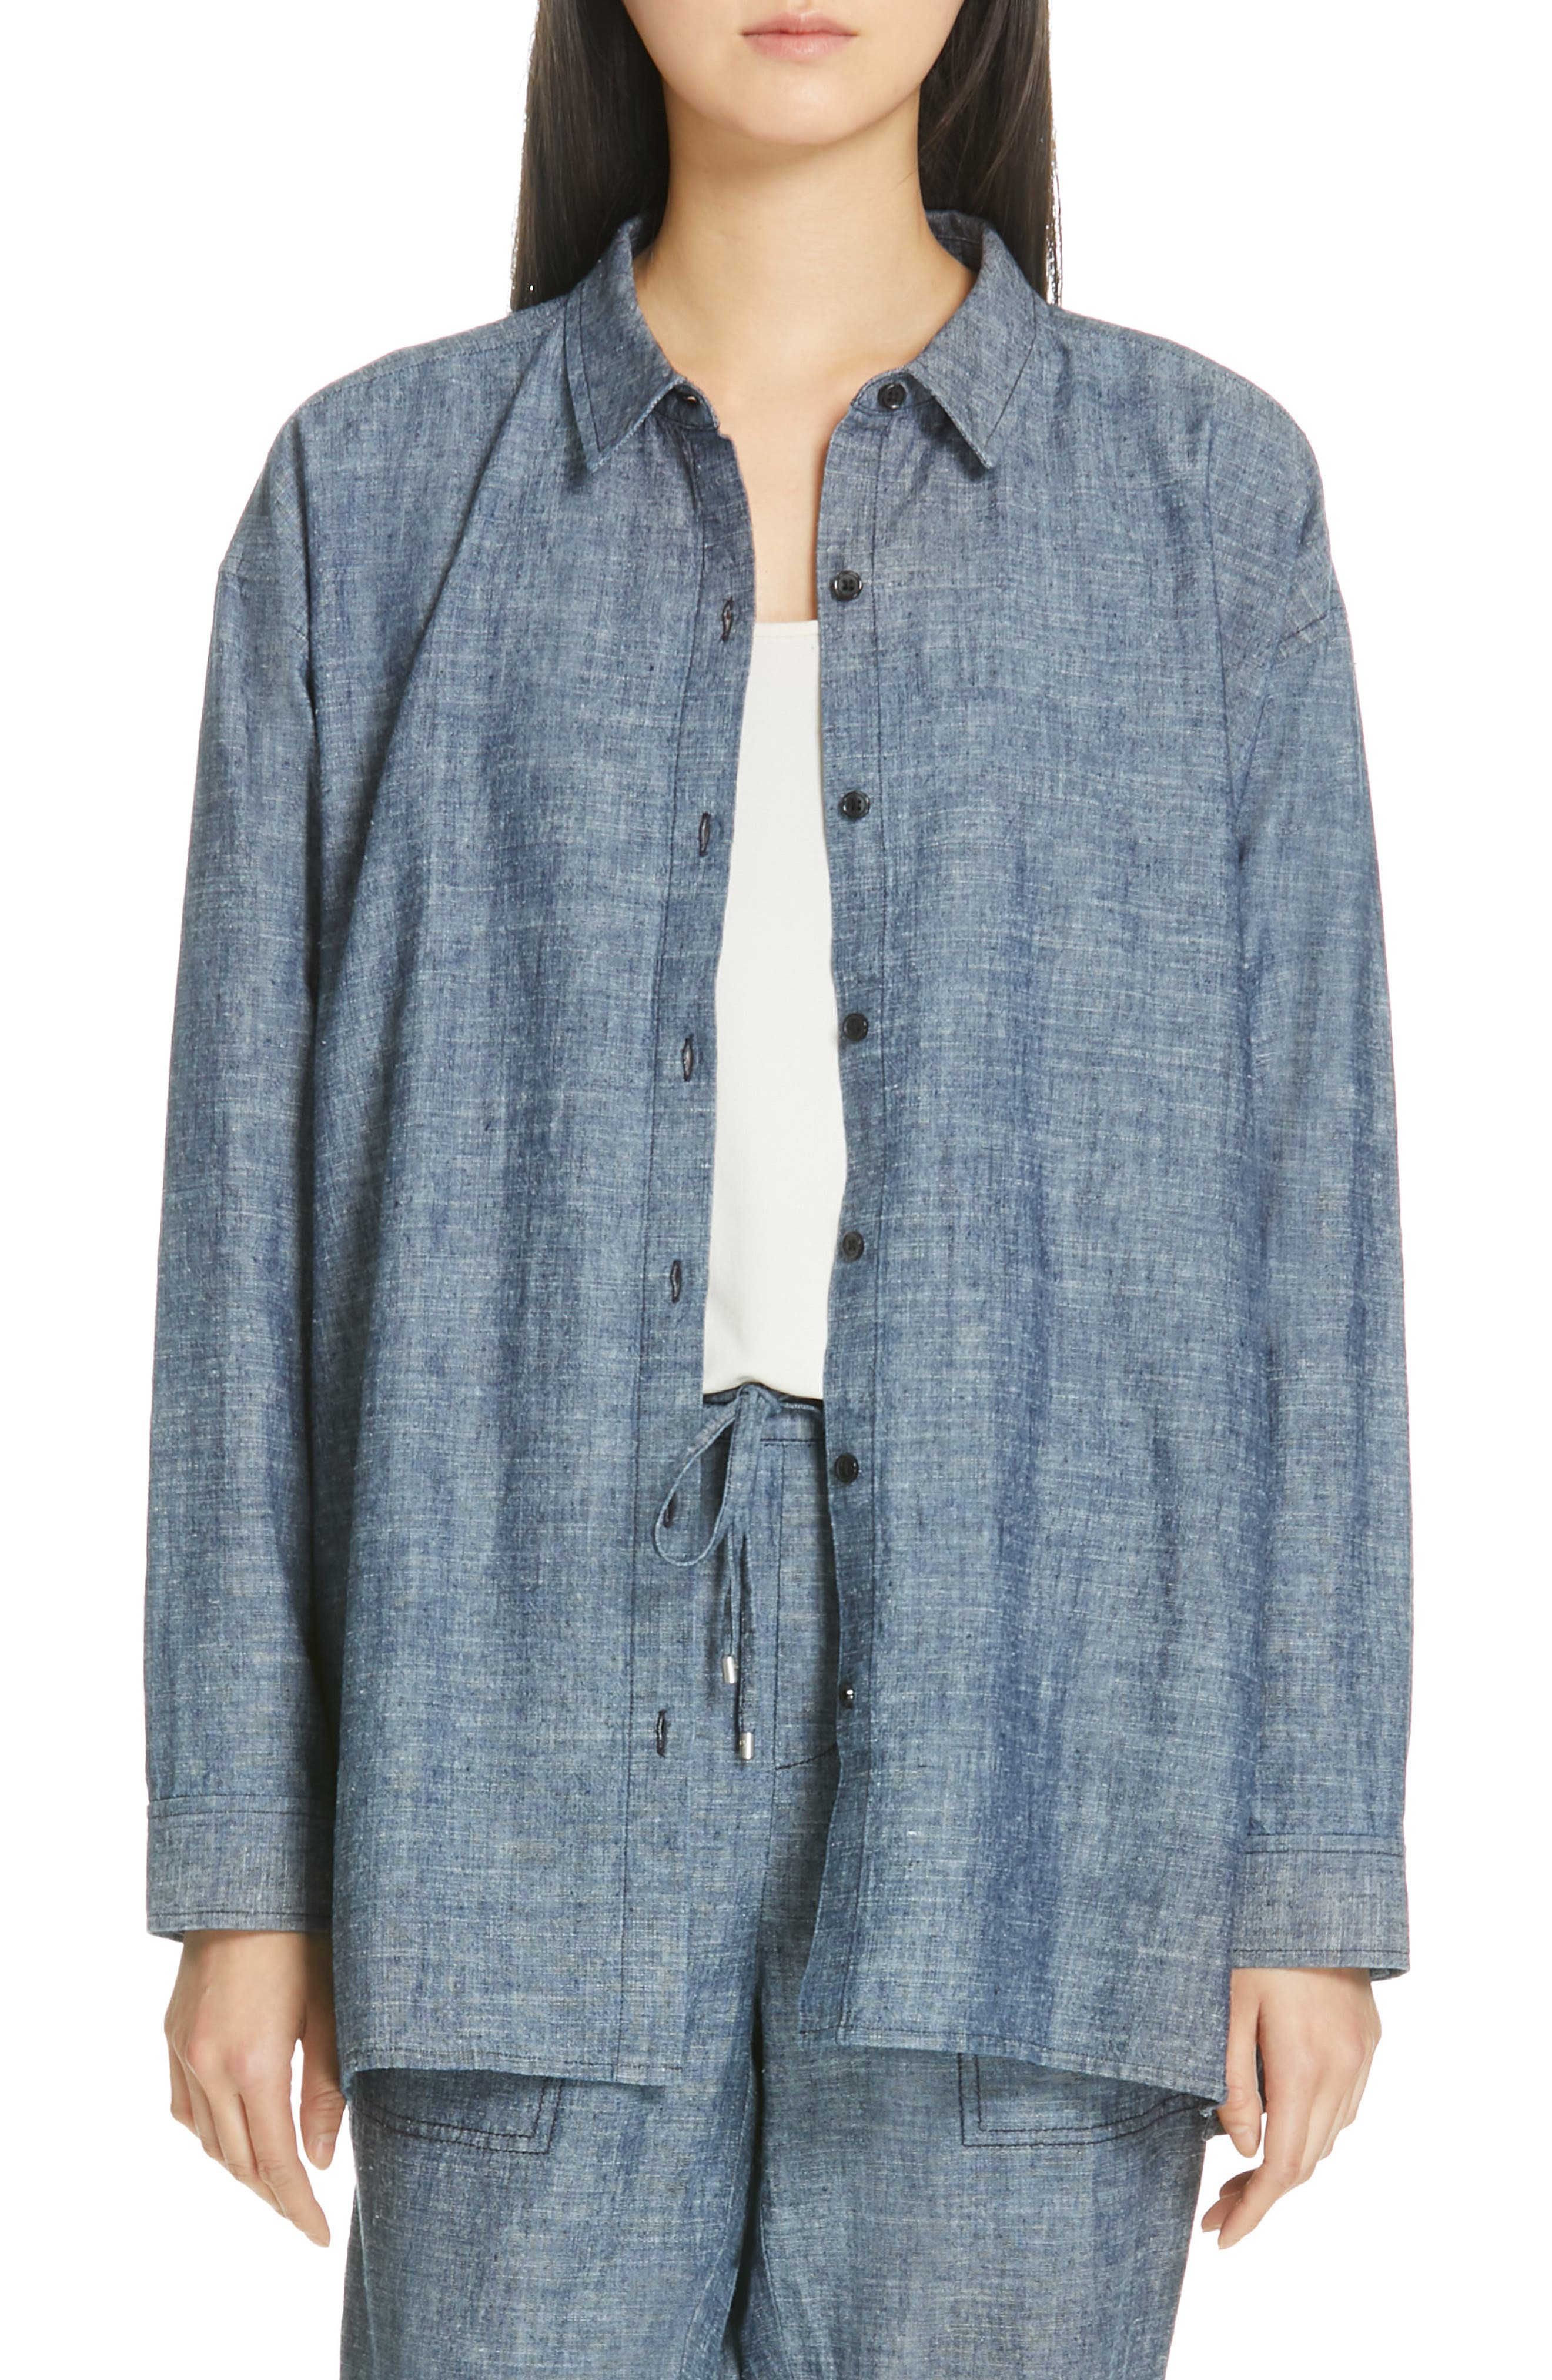 Eileen Fisher Woven Top, Blue